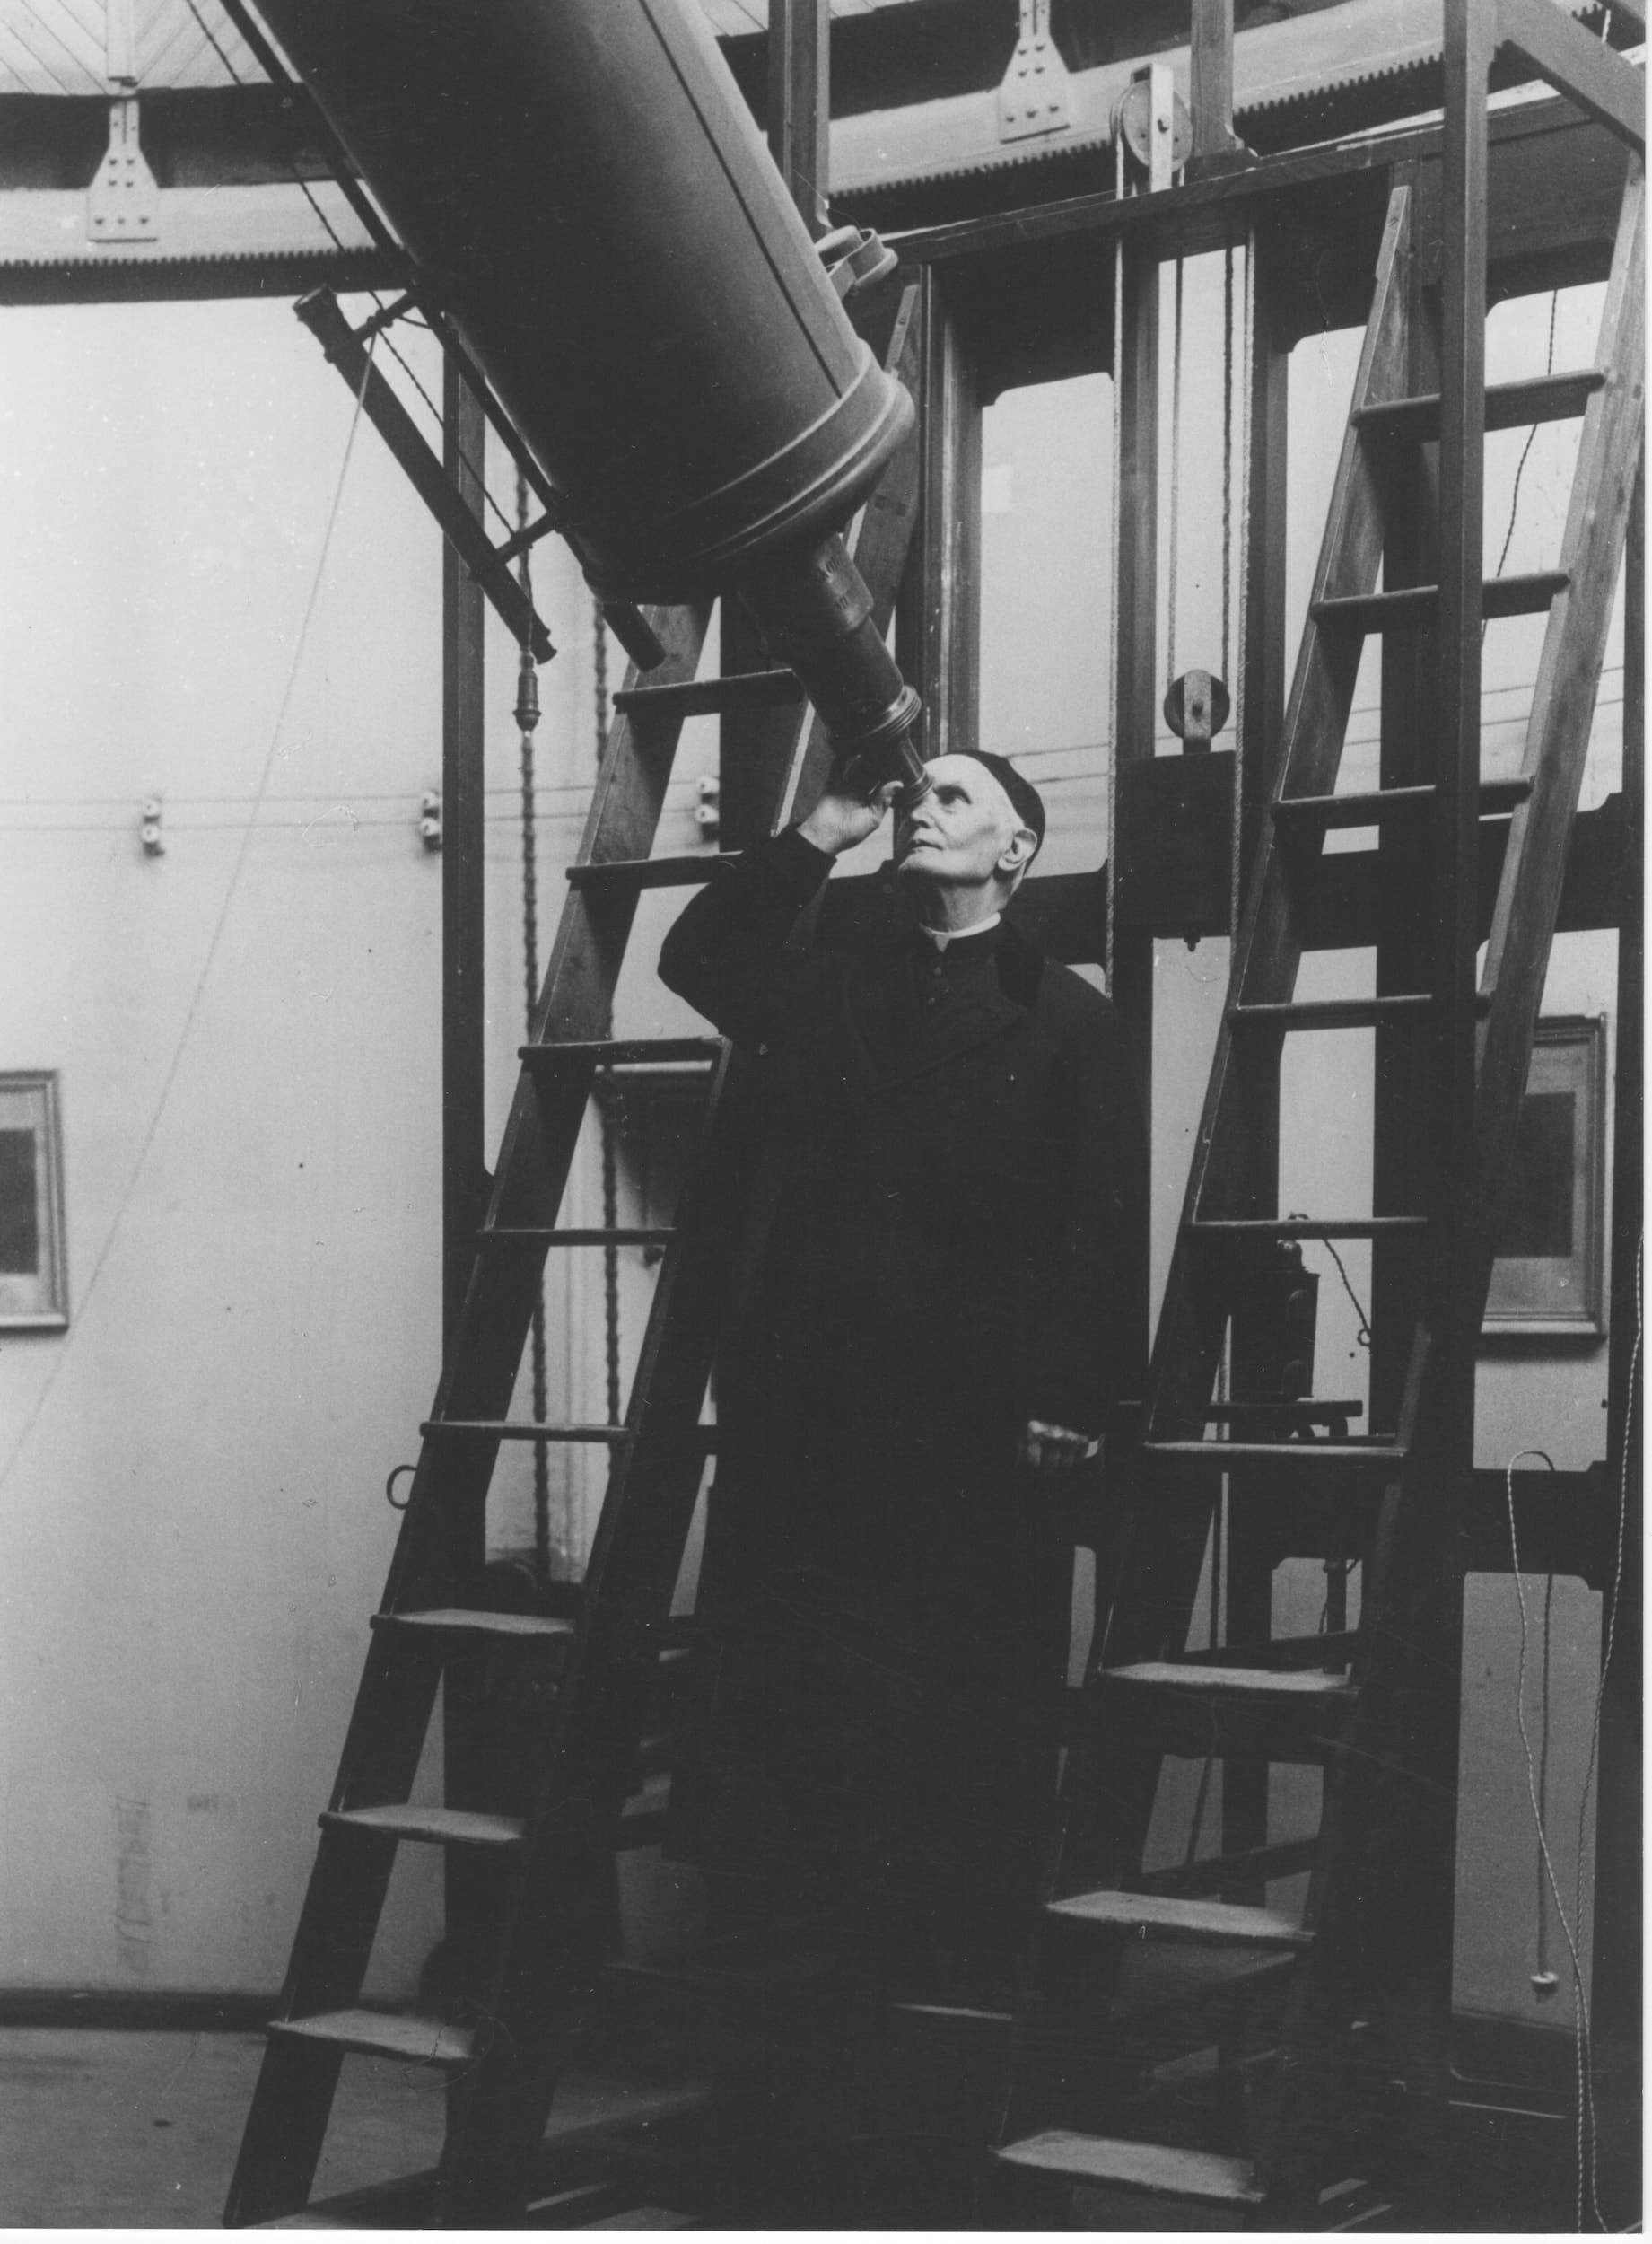 Hagen at the 1909 Merz telescope